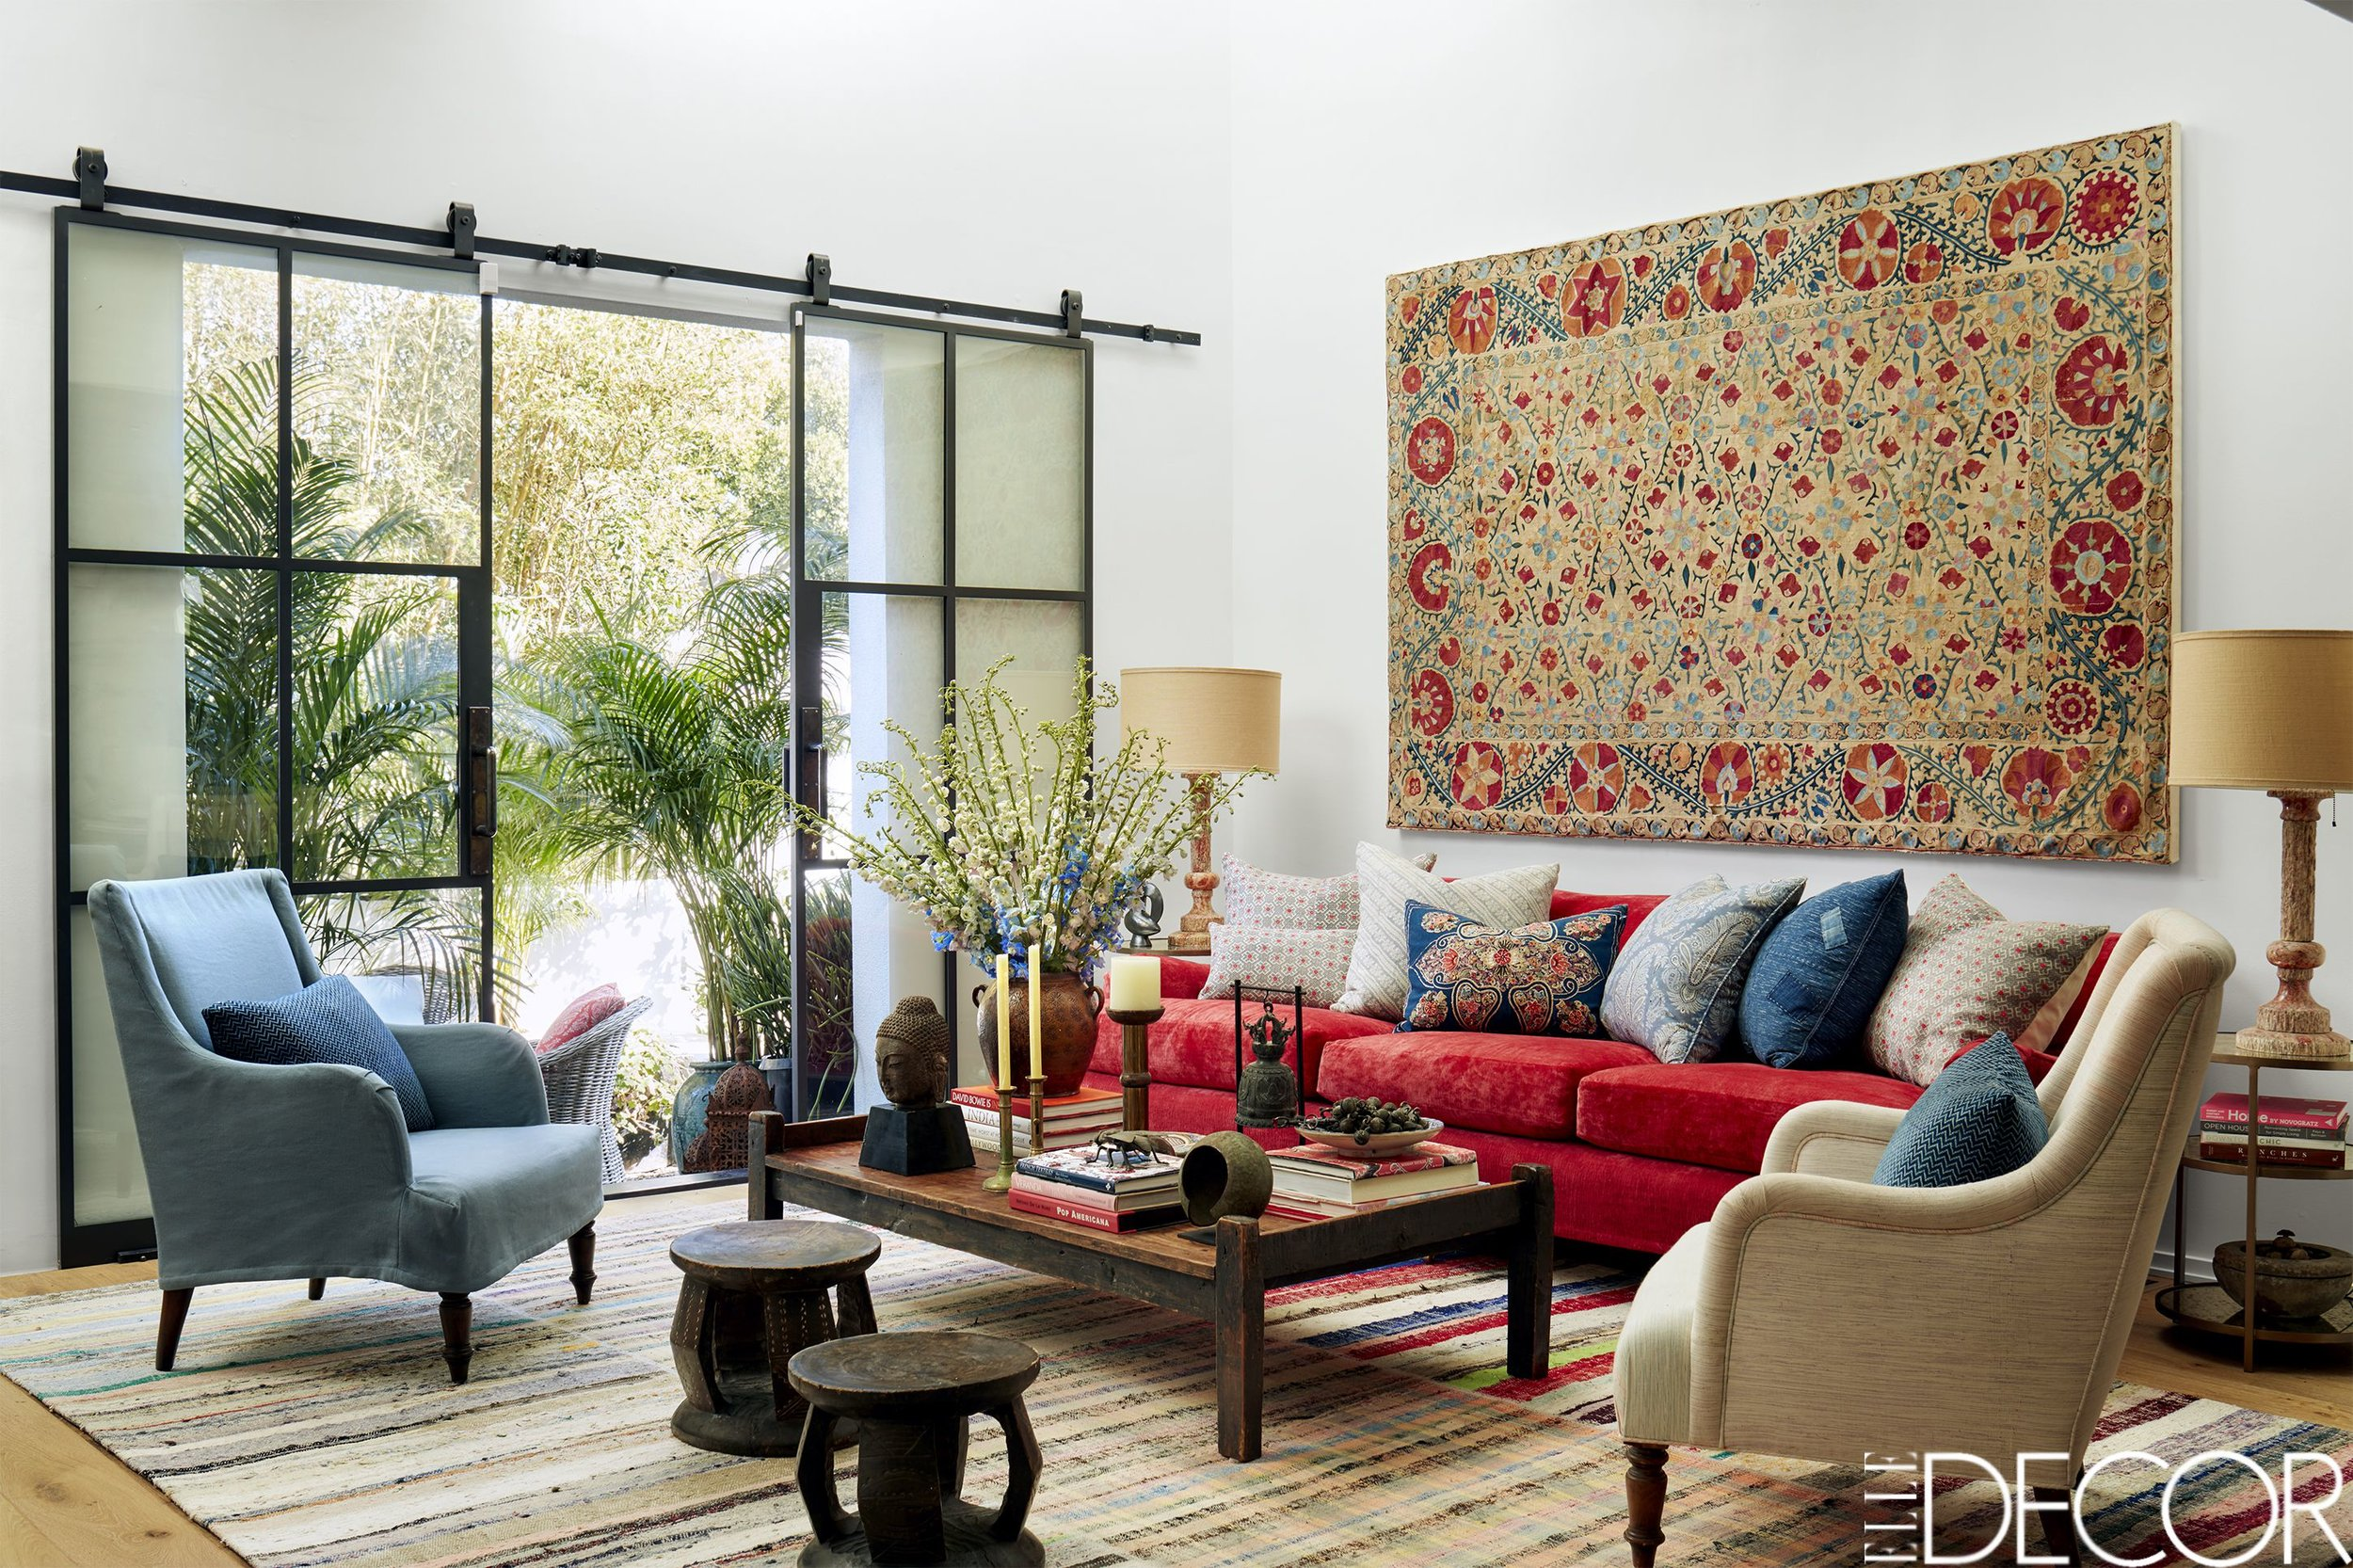 Elle Decor Interior Designers kathryn m ireland